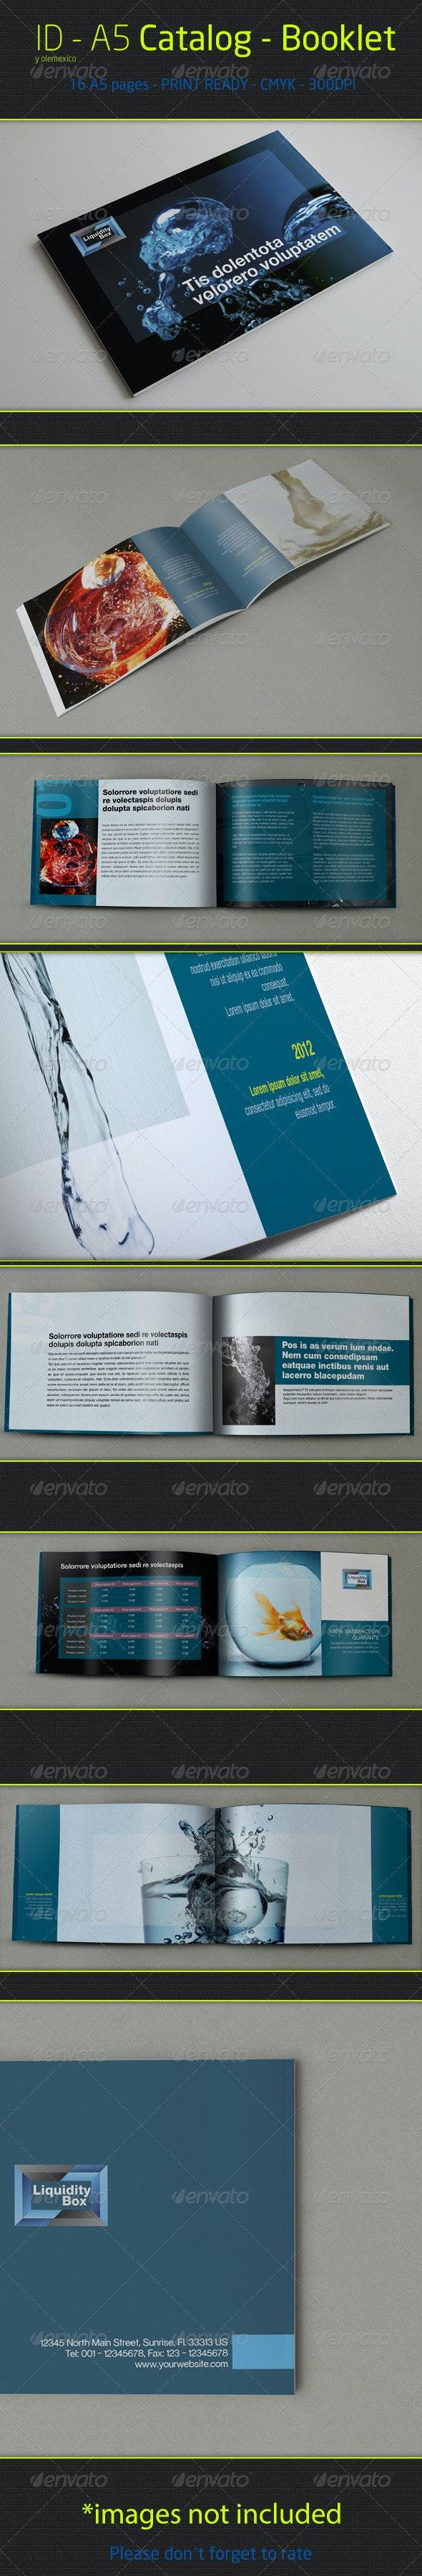 A5 Catalog - booklet - Catalogs Brochures